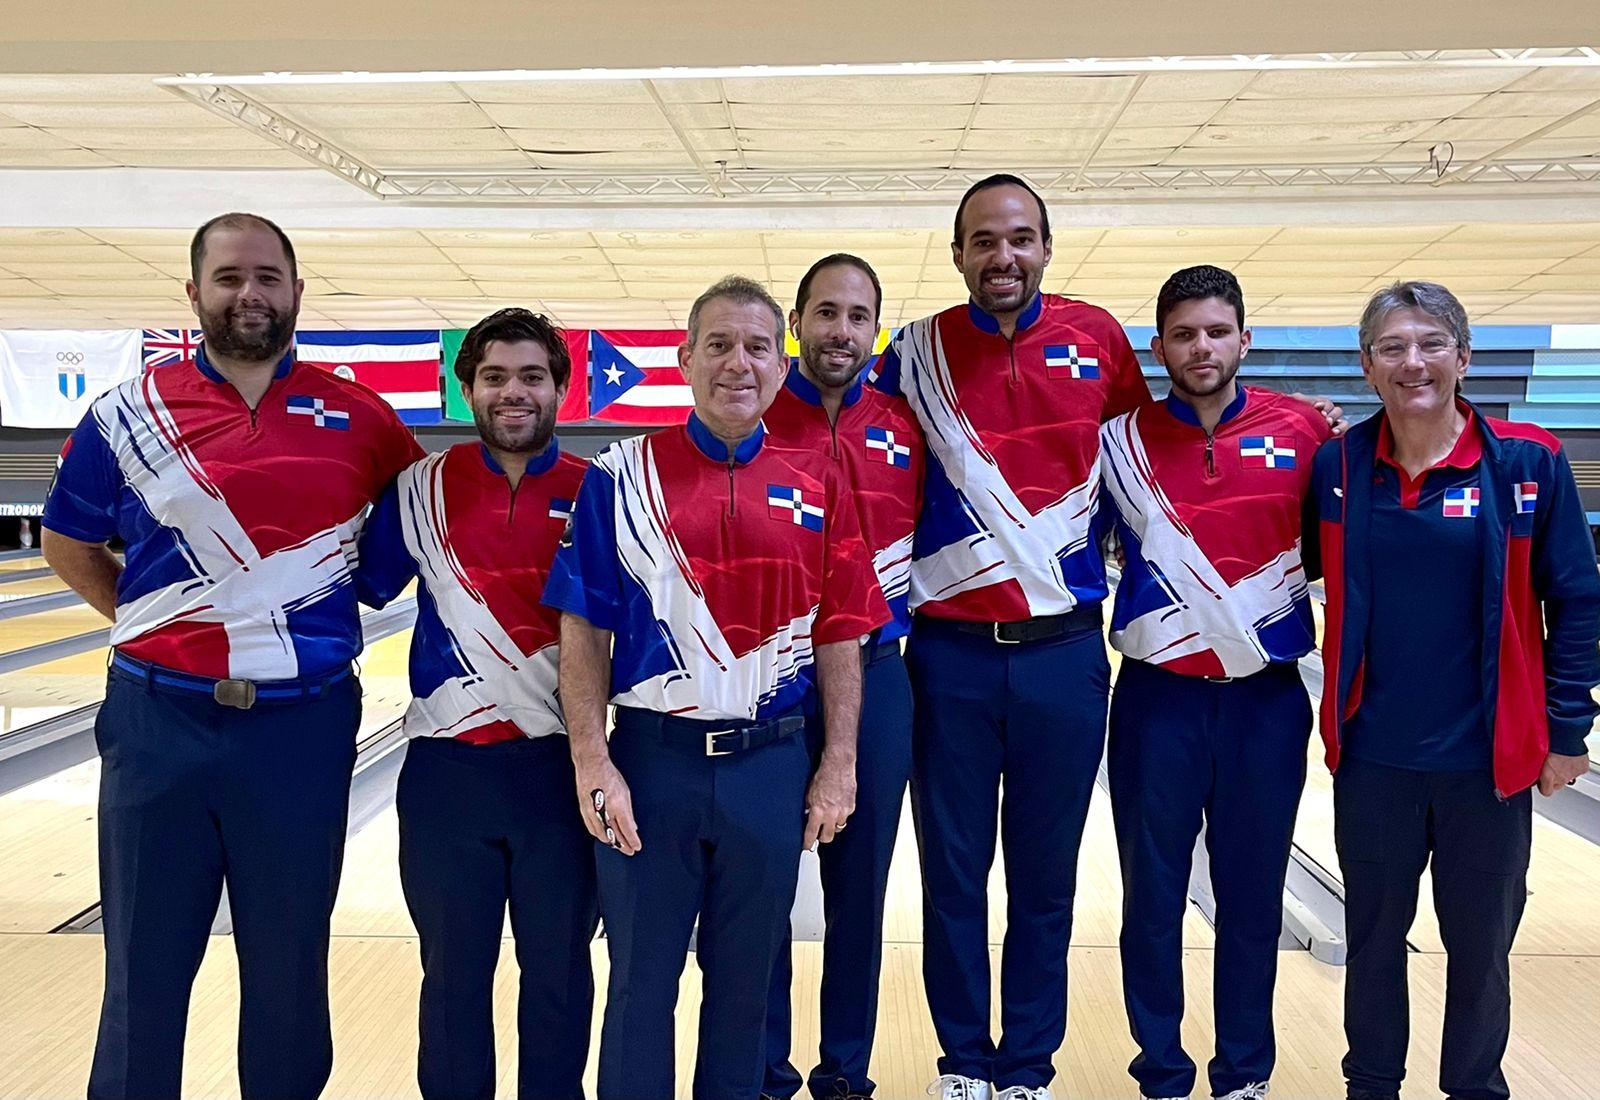 Boliche clasifica 12 atletas a JCC San Salvador 2023